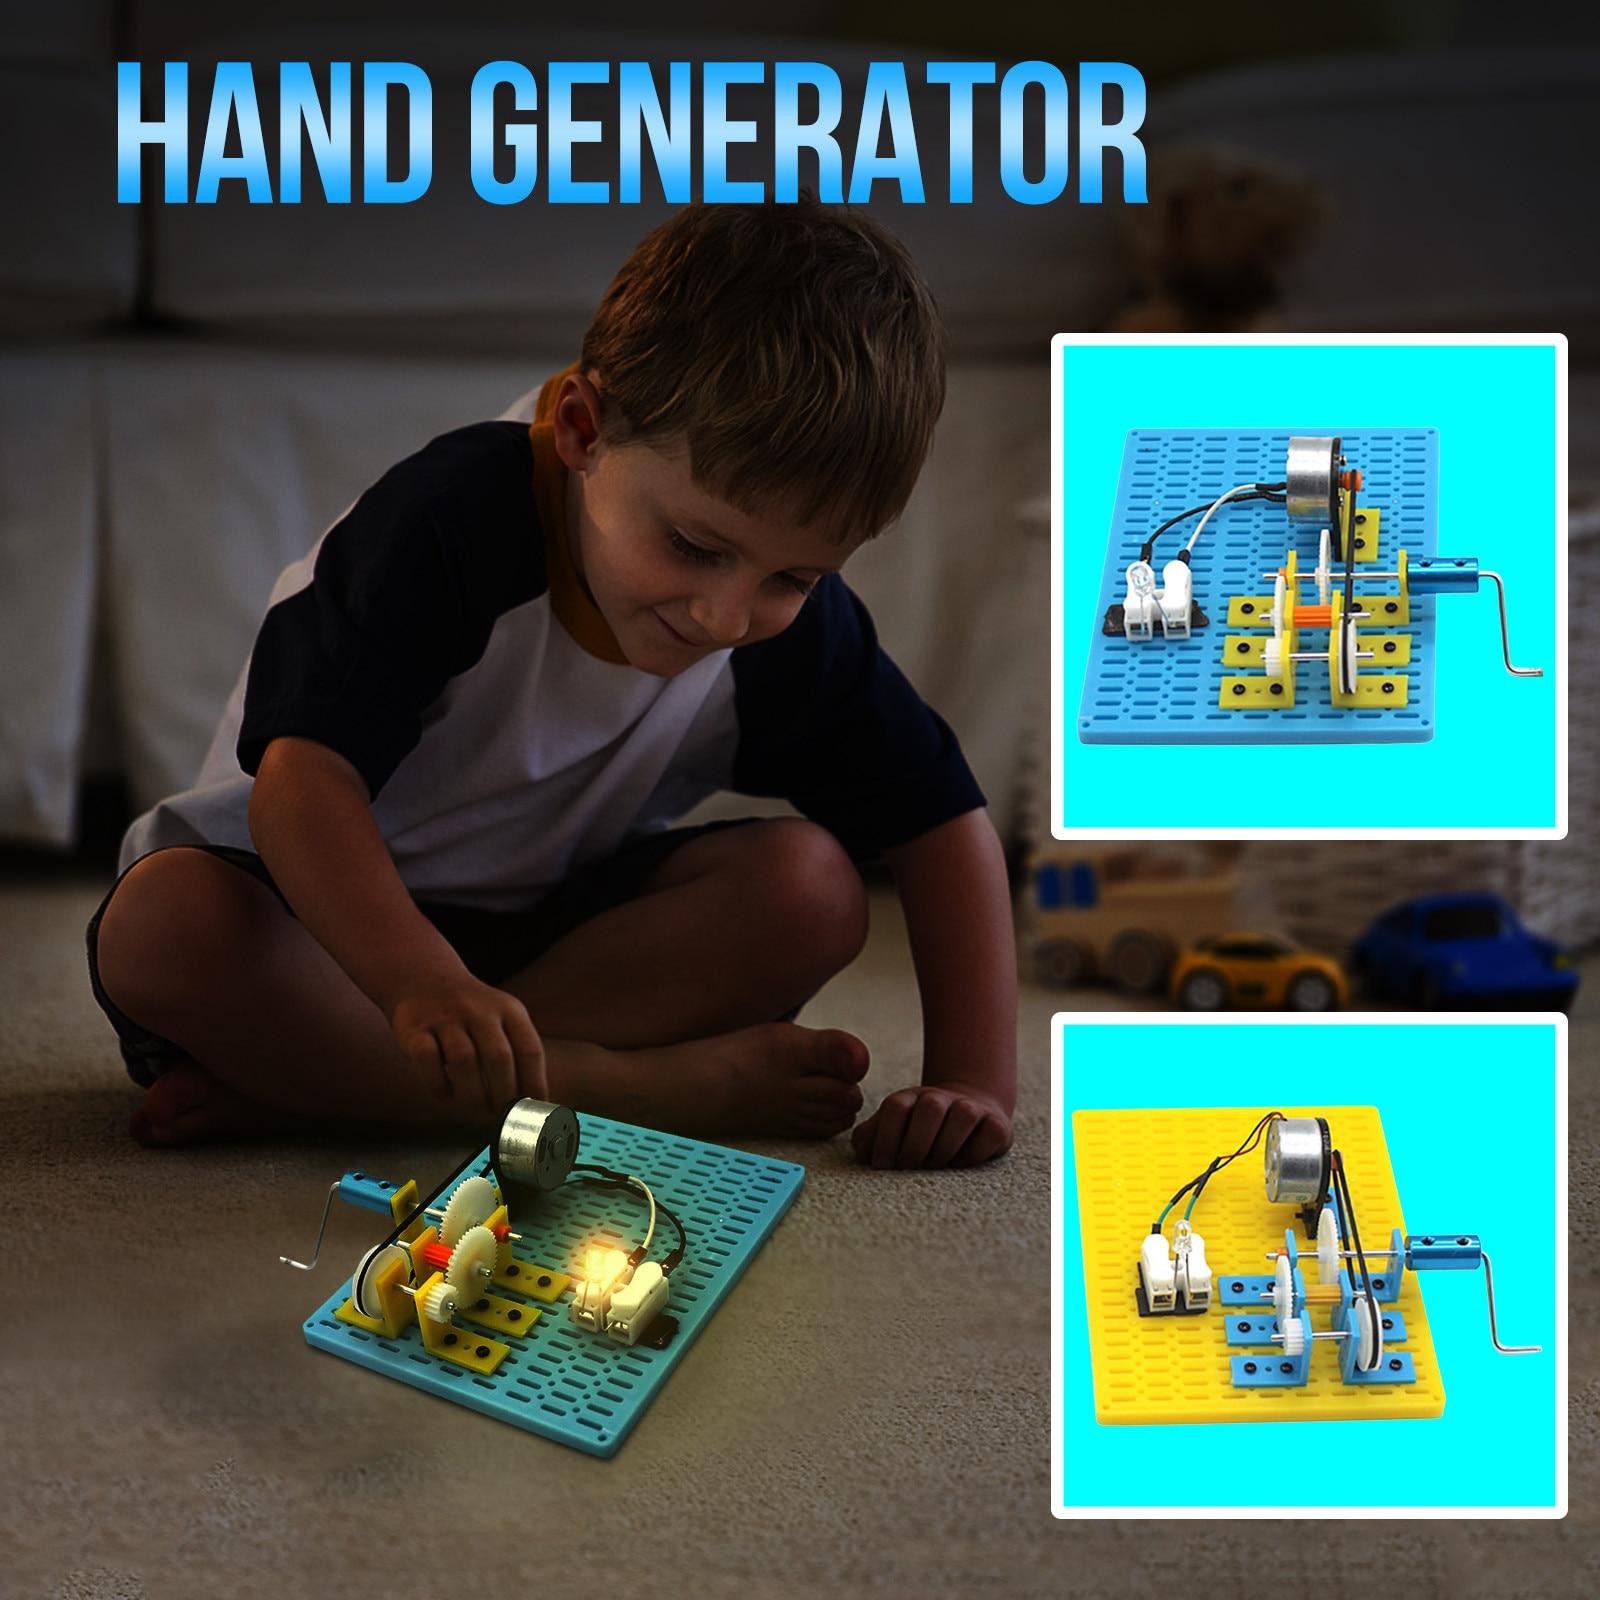 Mini generador de manivela manual, Kit tecnológico, experimento de ciencia, juguete infantil educativo, iluminación LED